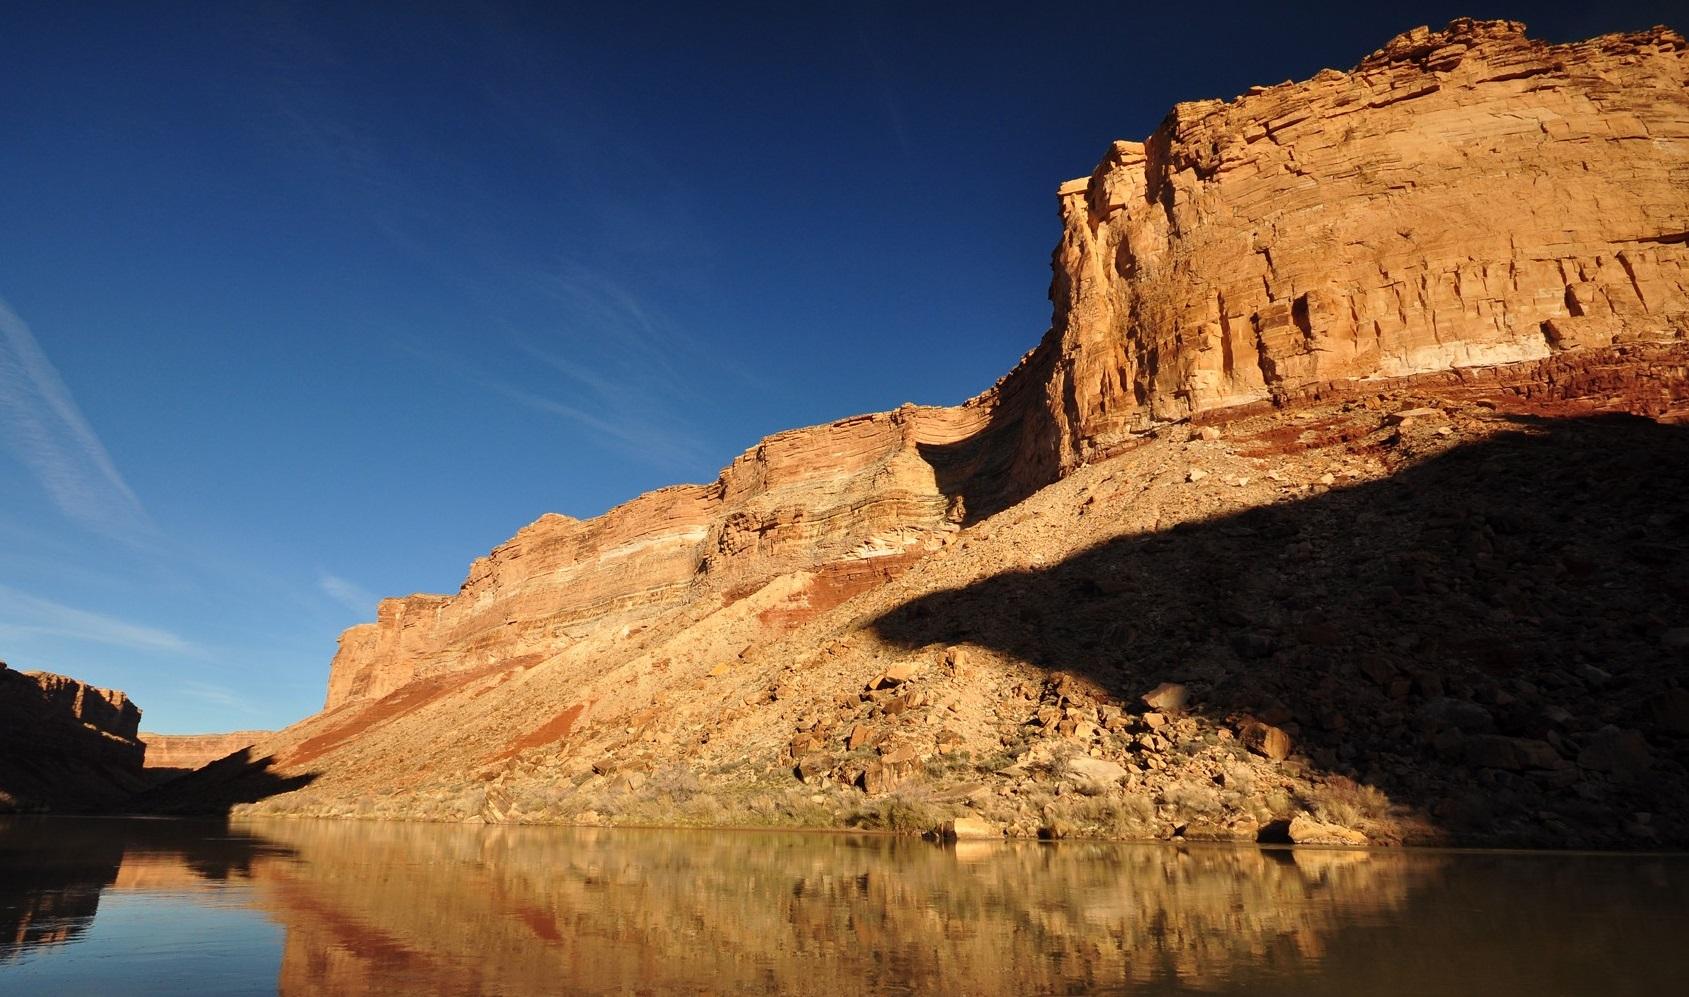 Каньон Отражение (Reflection Canyon), Юта, США